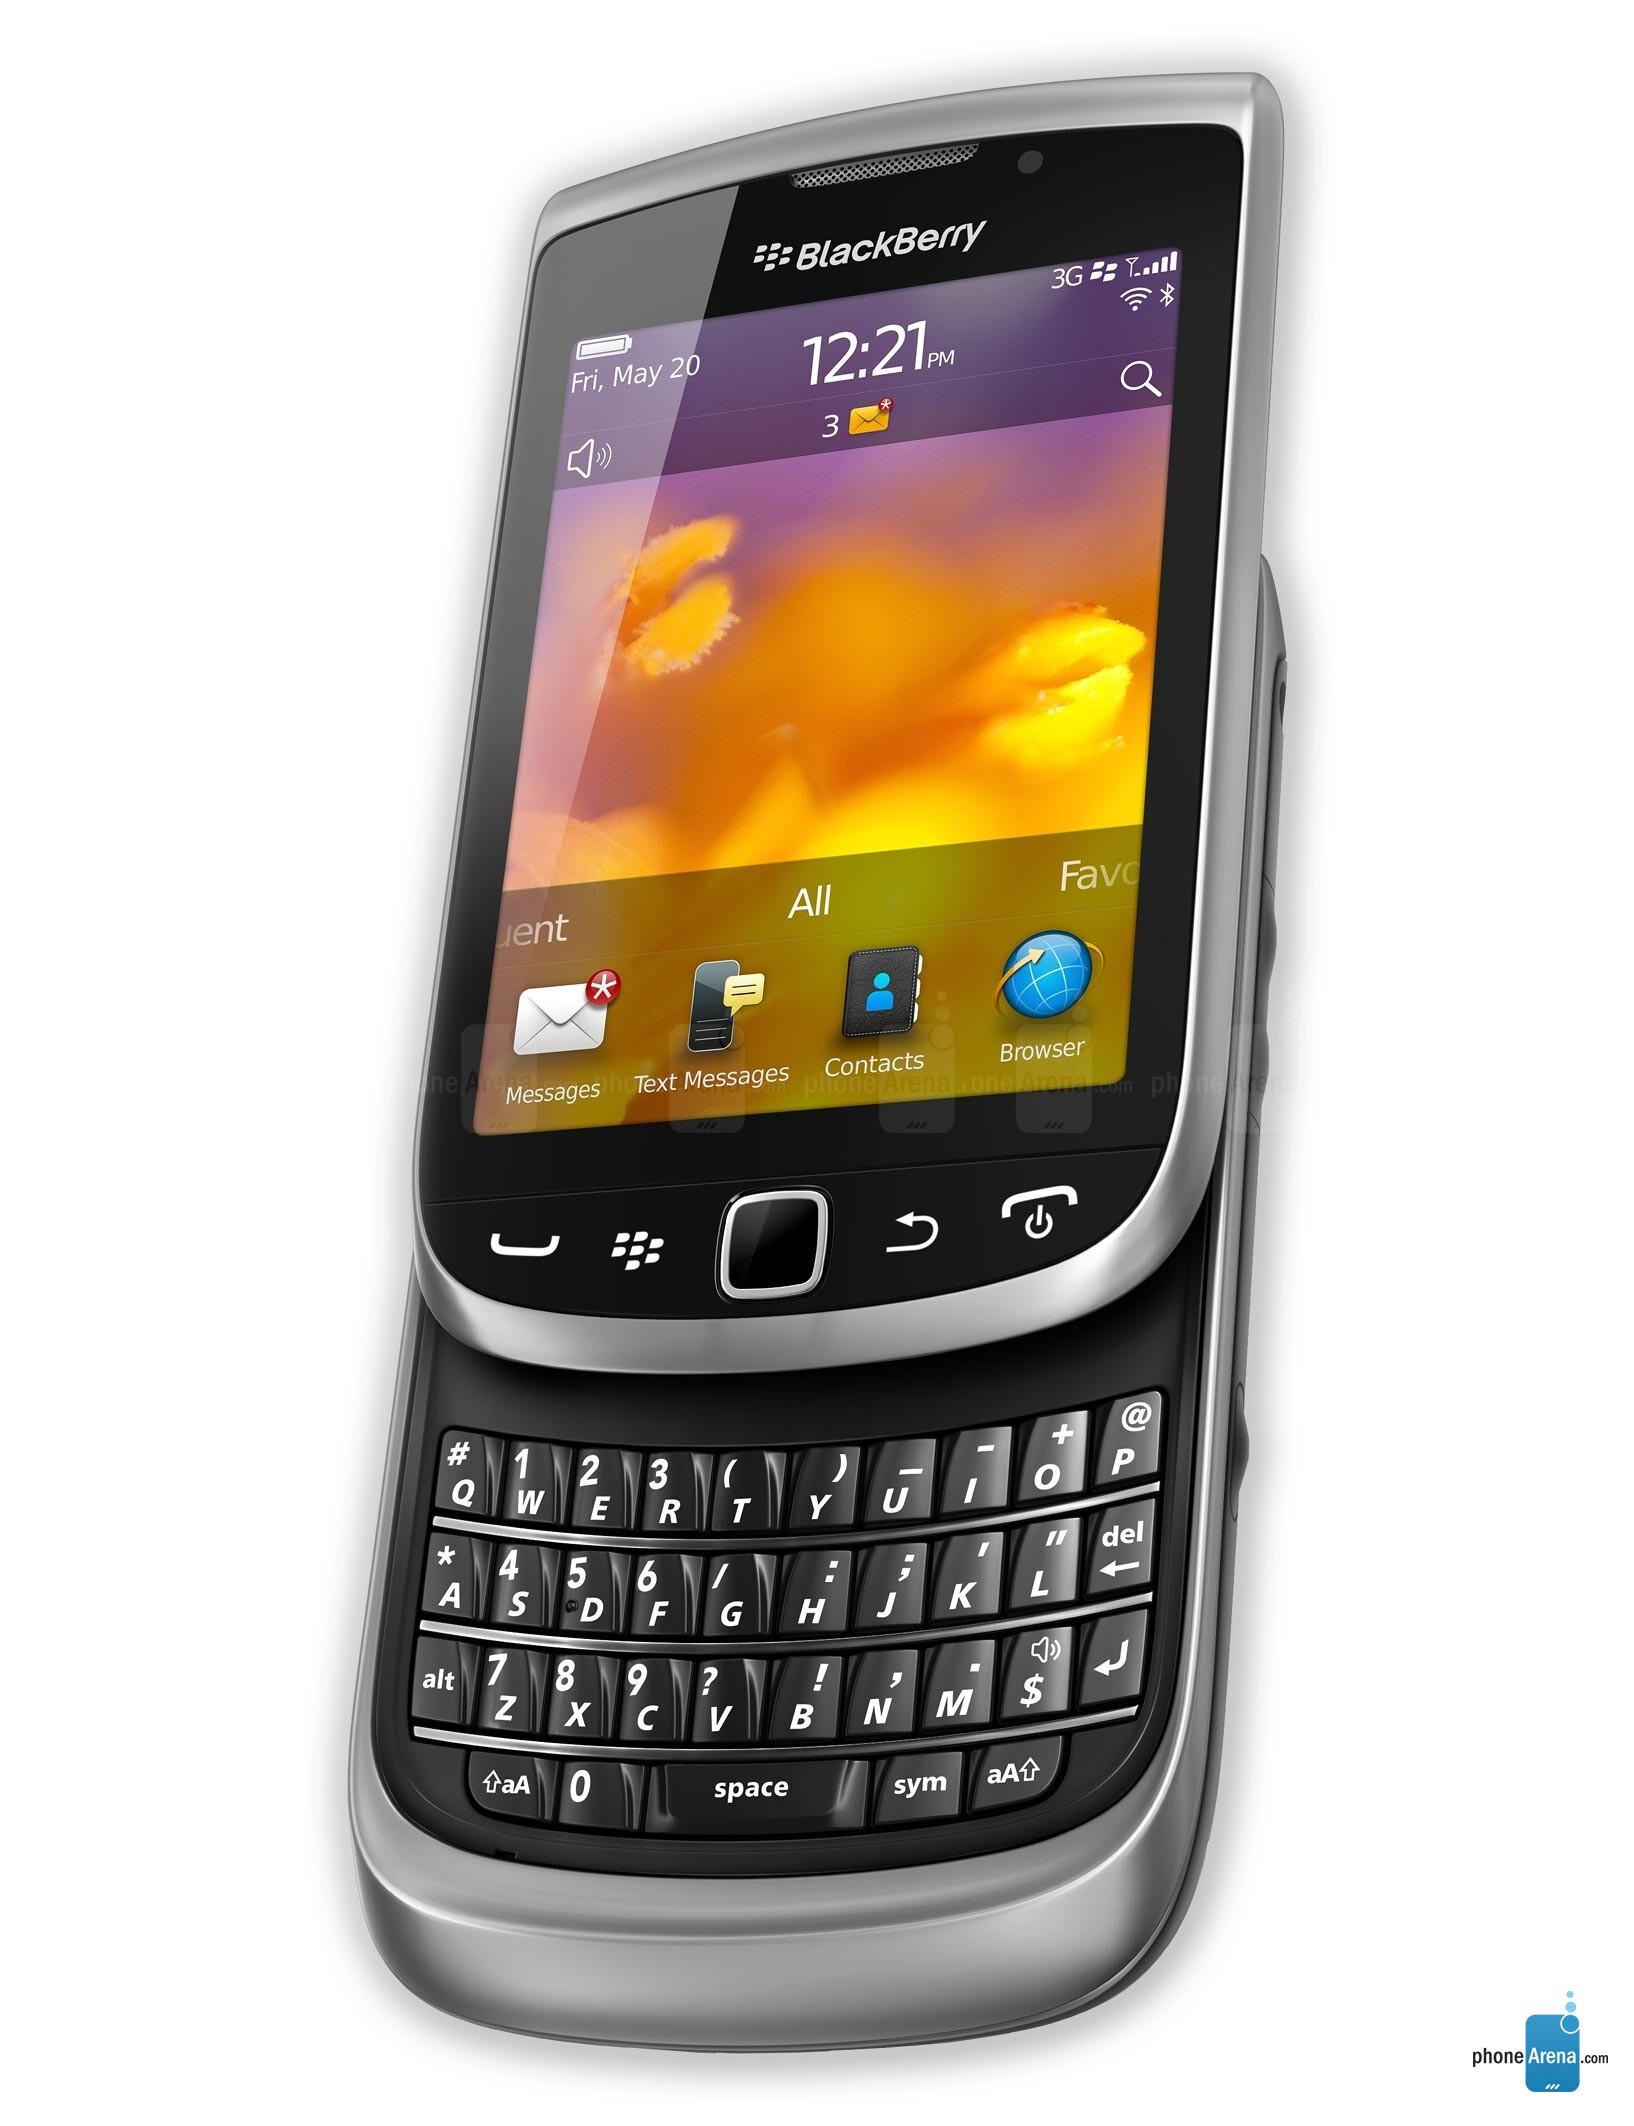 blackberry torch 9810 photos rh phonearena com BlackBerry Torch 9850 BlackBerry Torch 9850